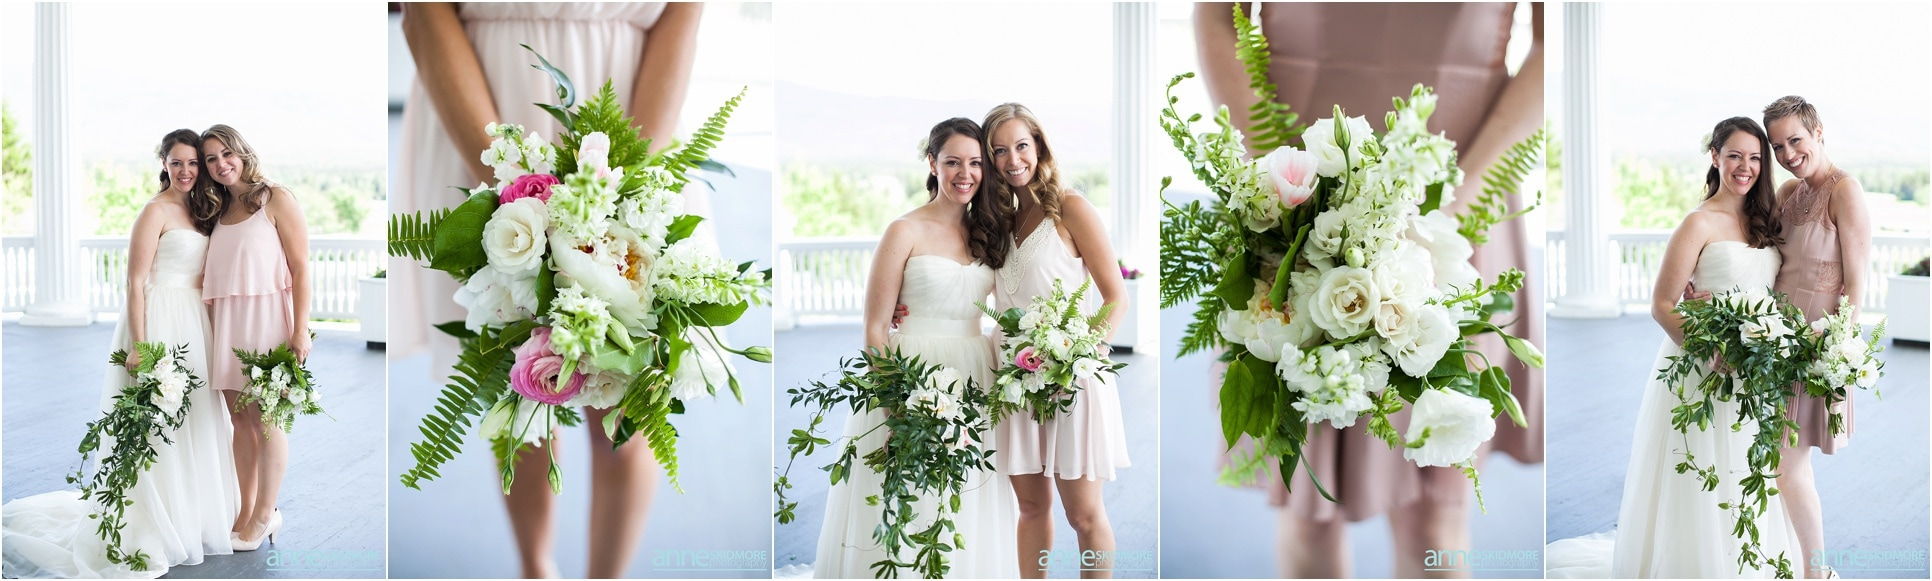 Omni_Mount_Washington_Wedding_0019